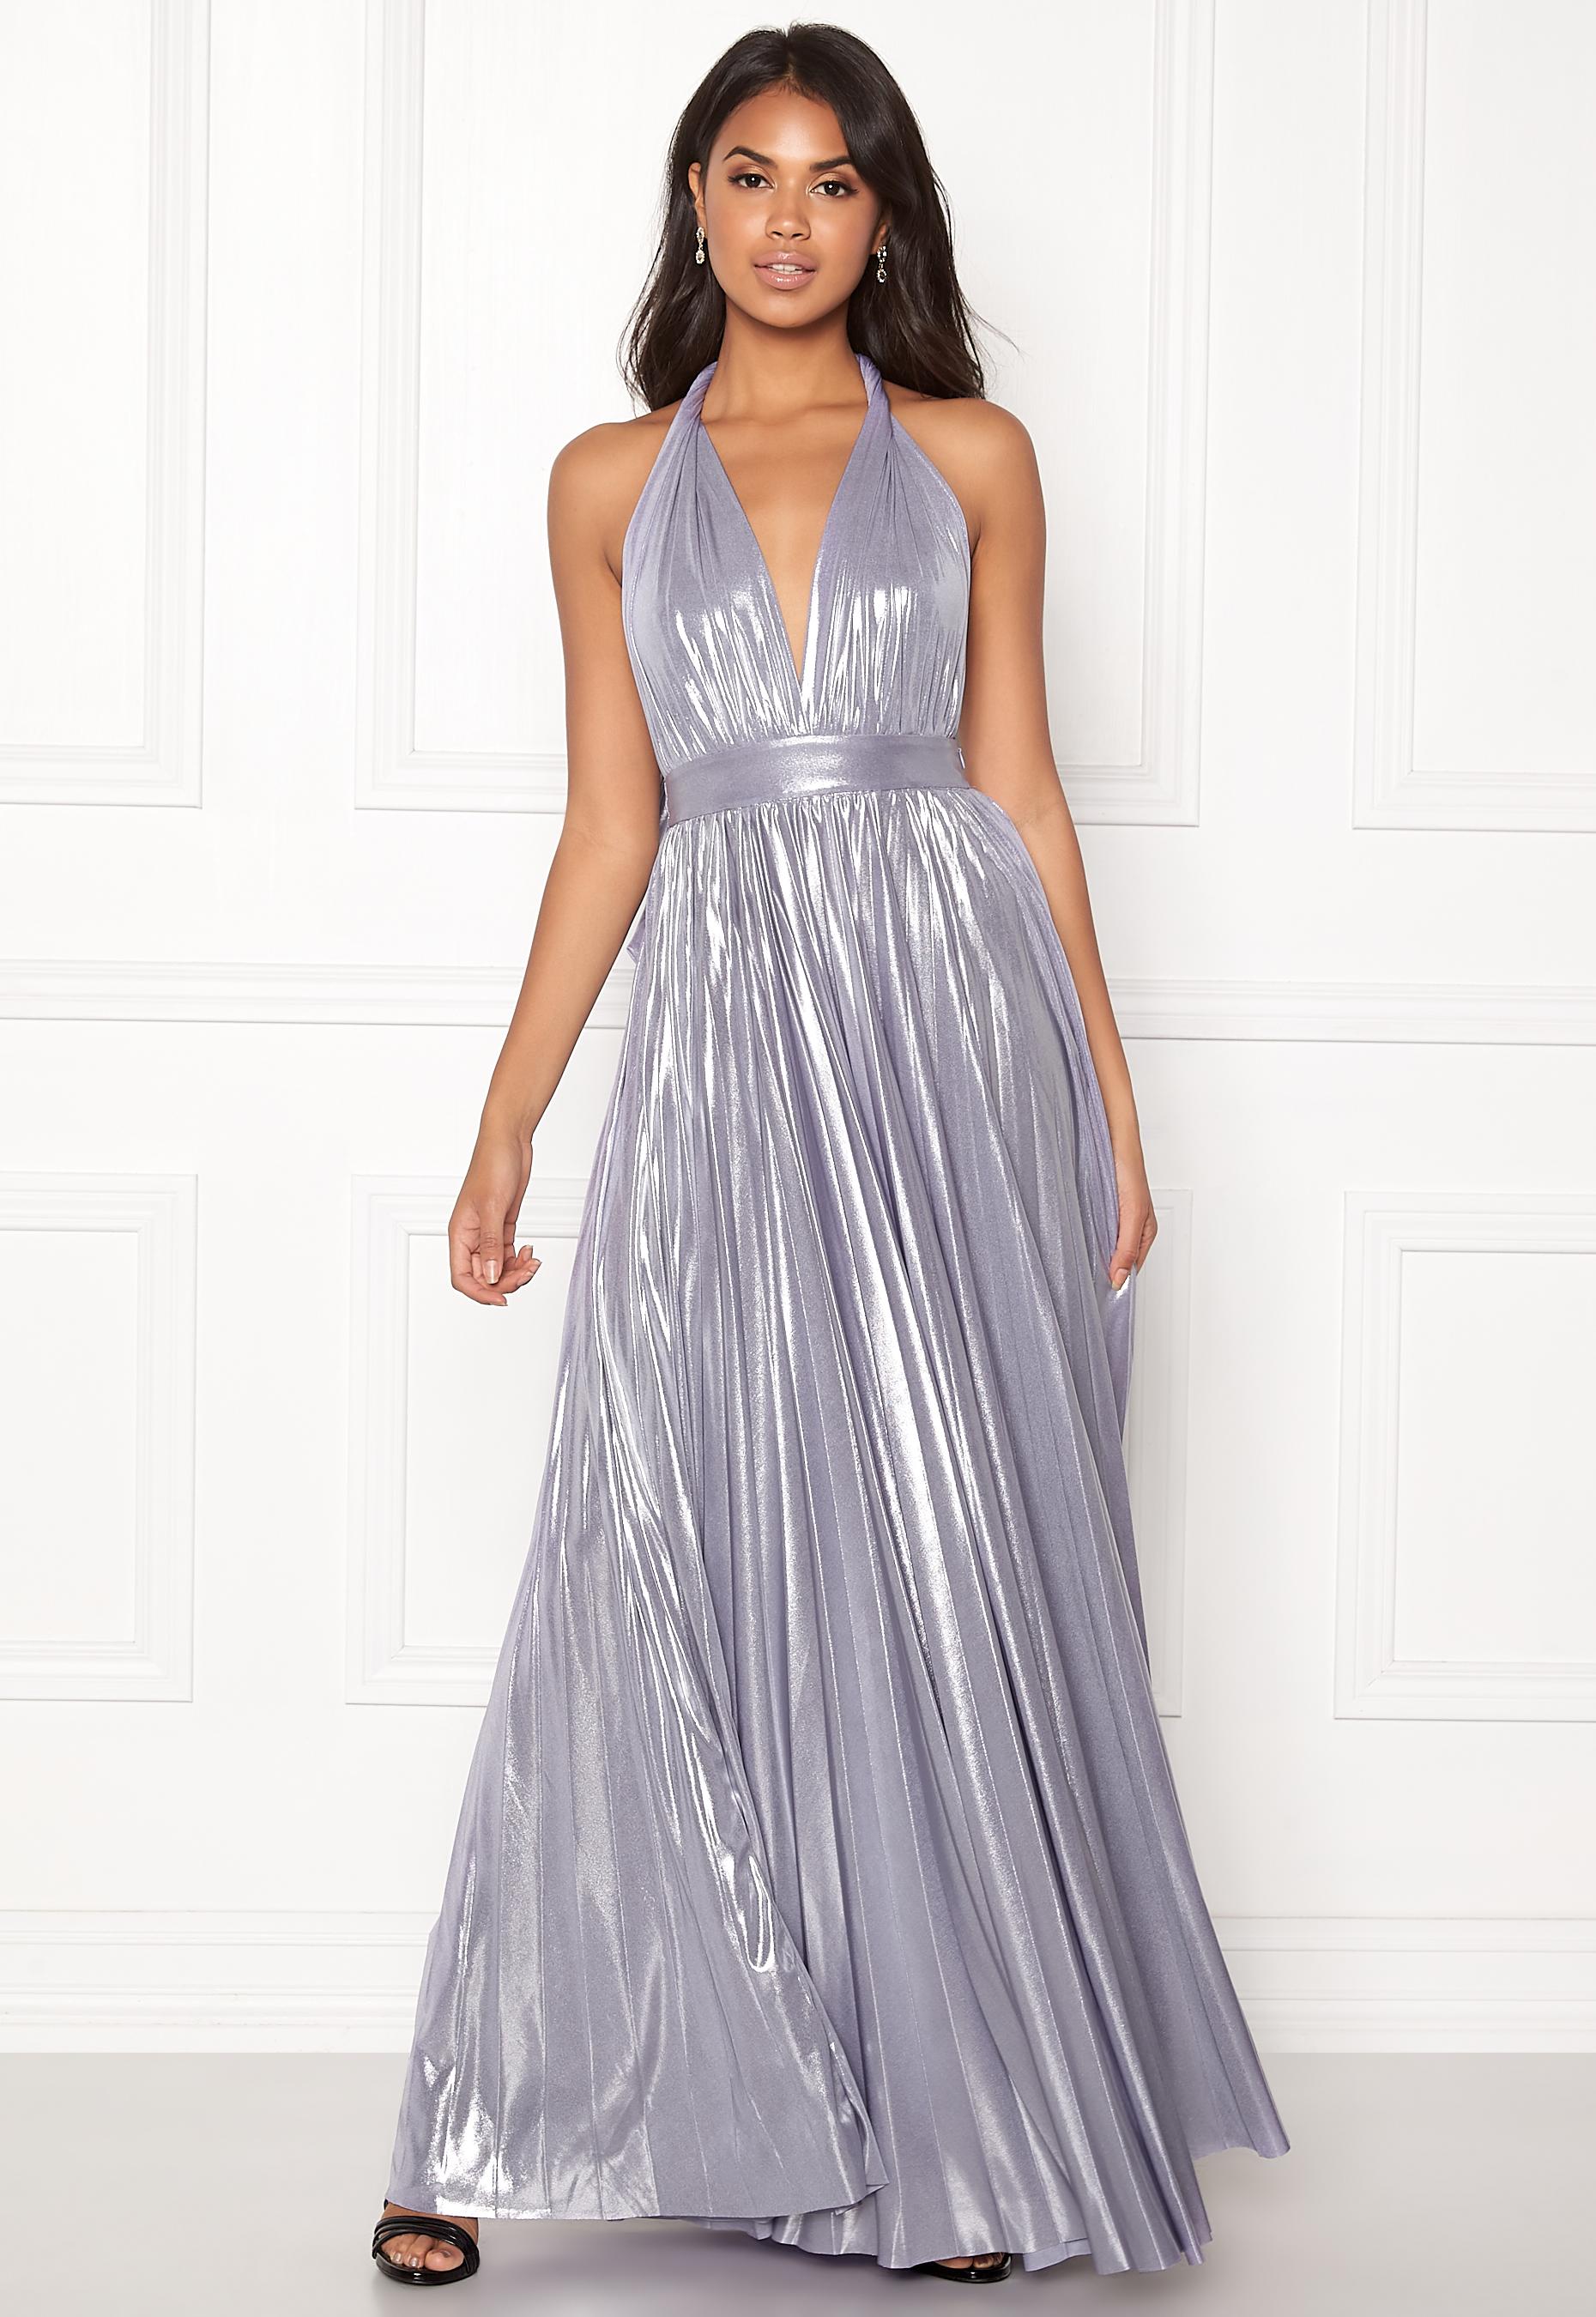 6271b6ac72 Goddiva Deep V Neck Metallic Dress Lavender - Bubbleroom